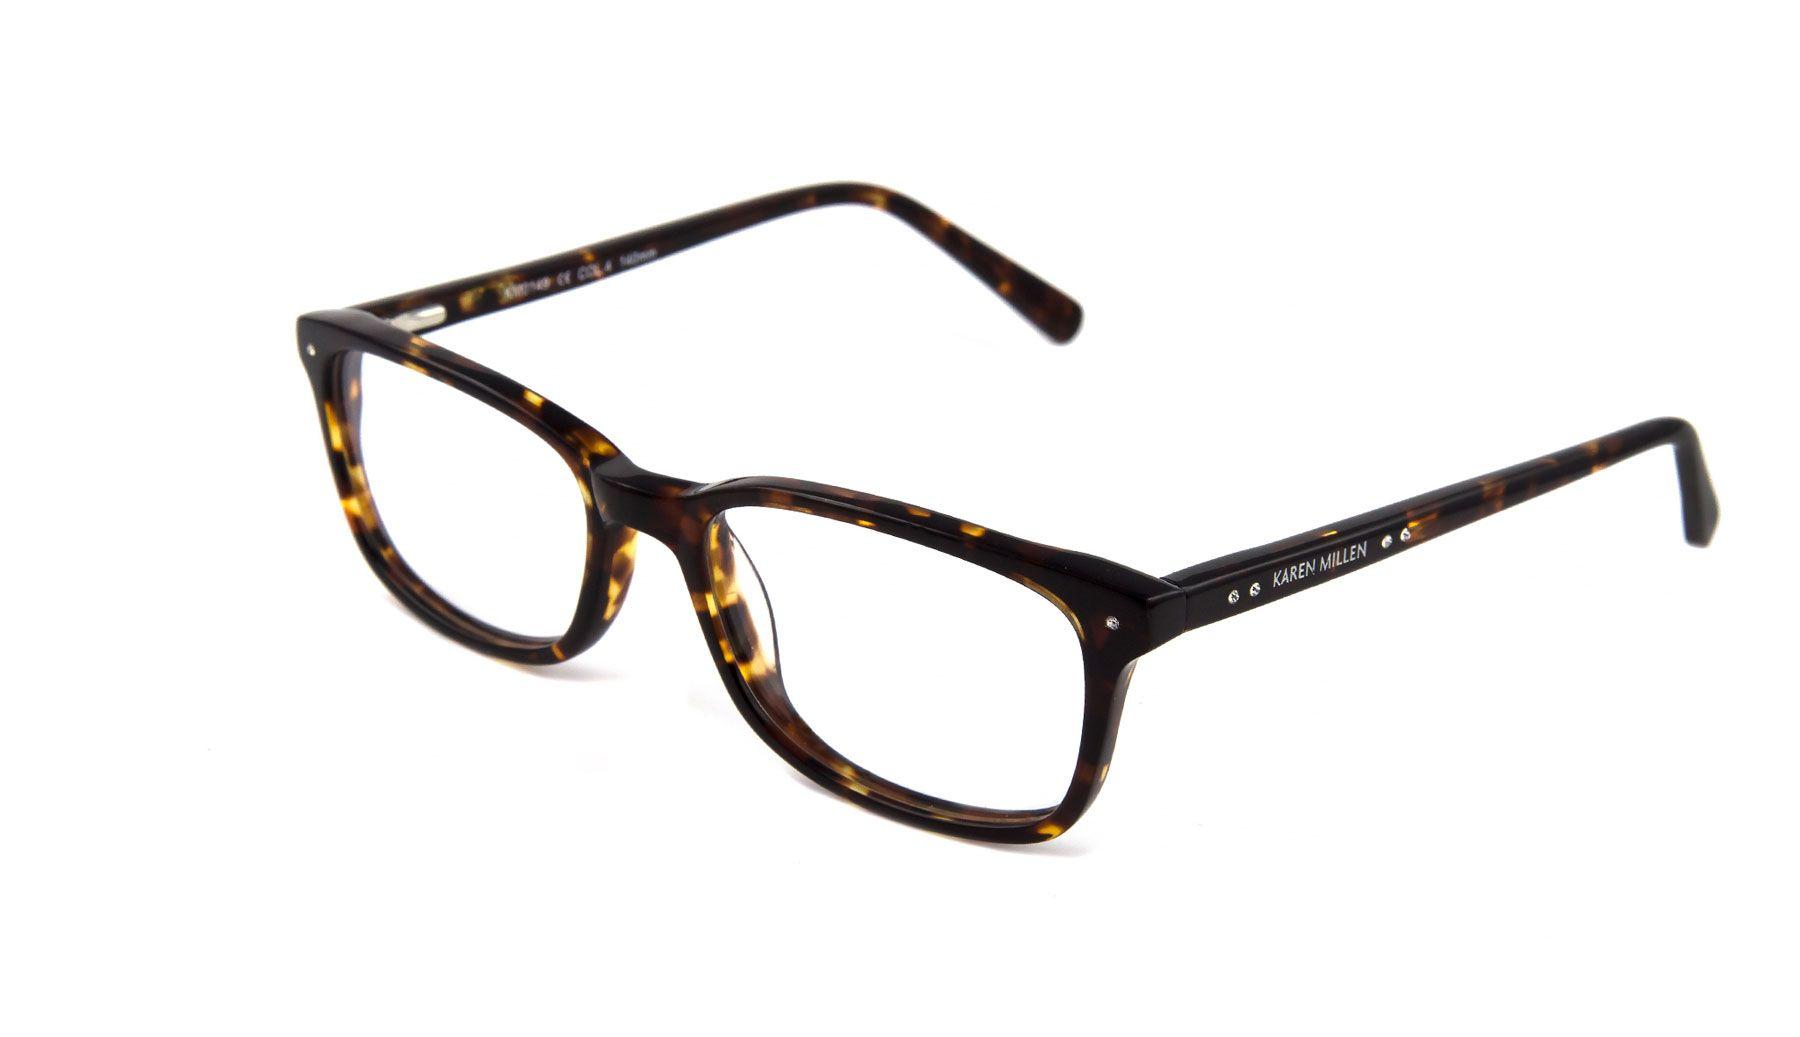 Image result for image glasses